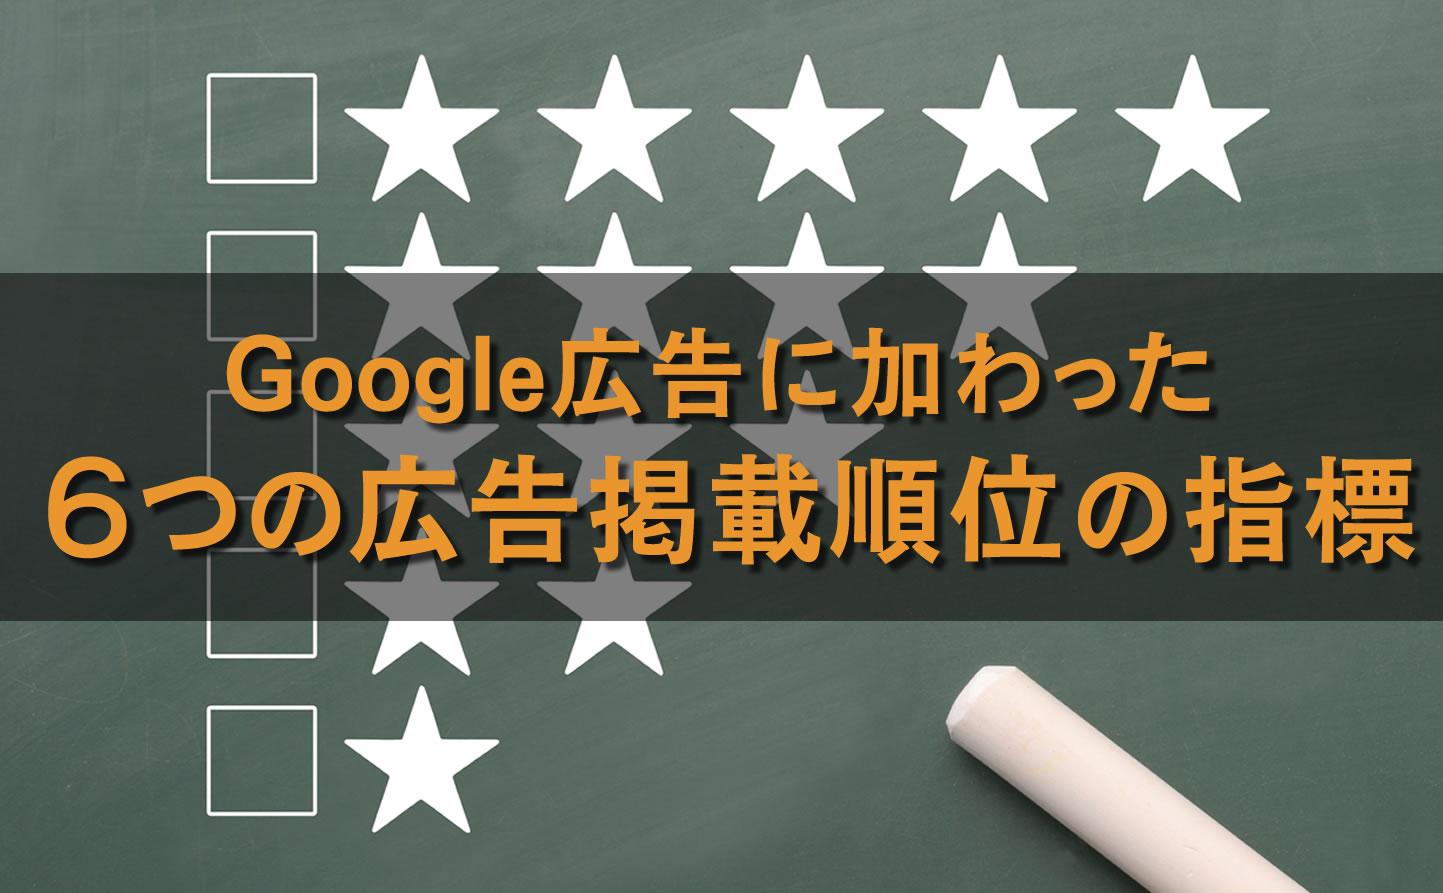 Google広告に新しく加わった6つの広告掲載順位の指標|上部・最上部のインプレッションシェア